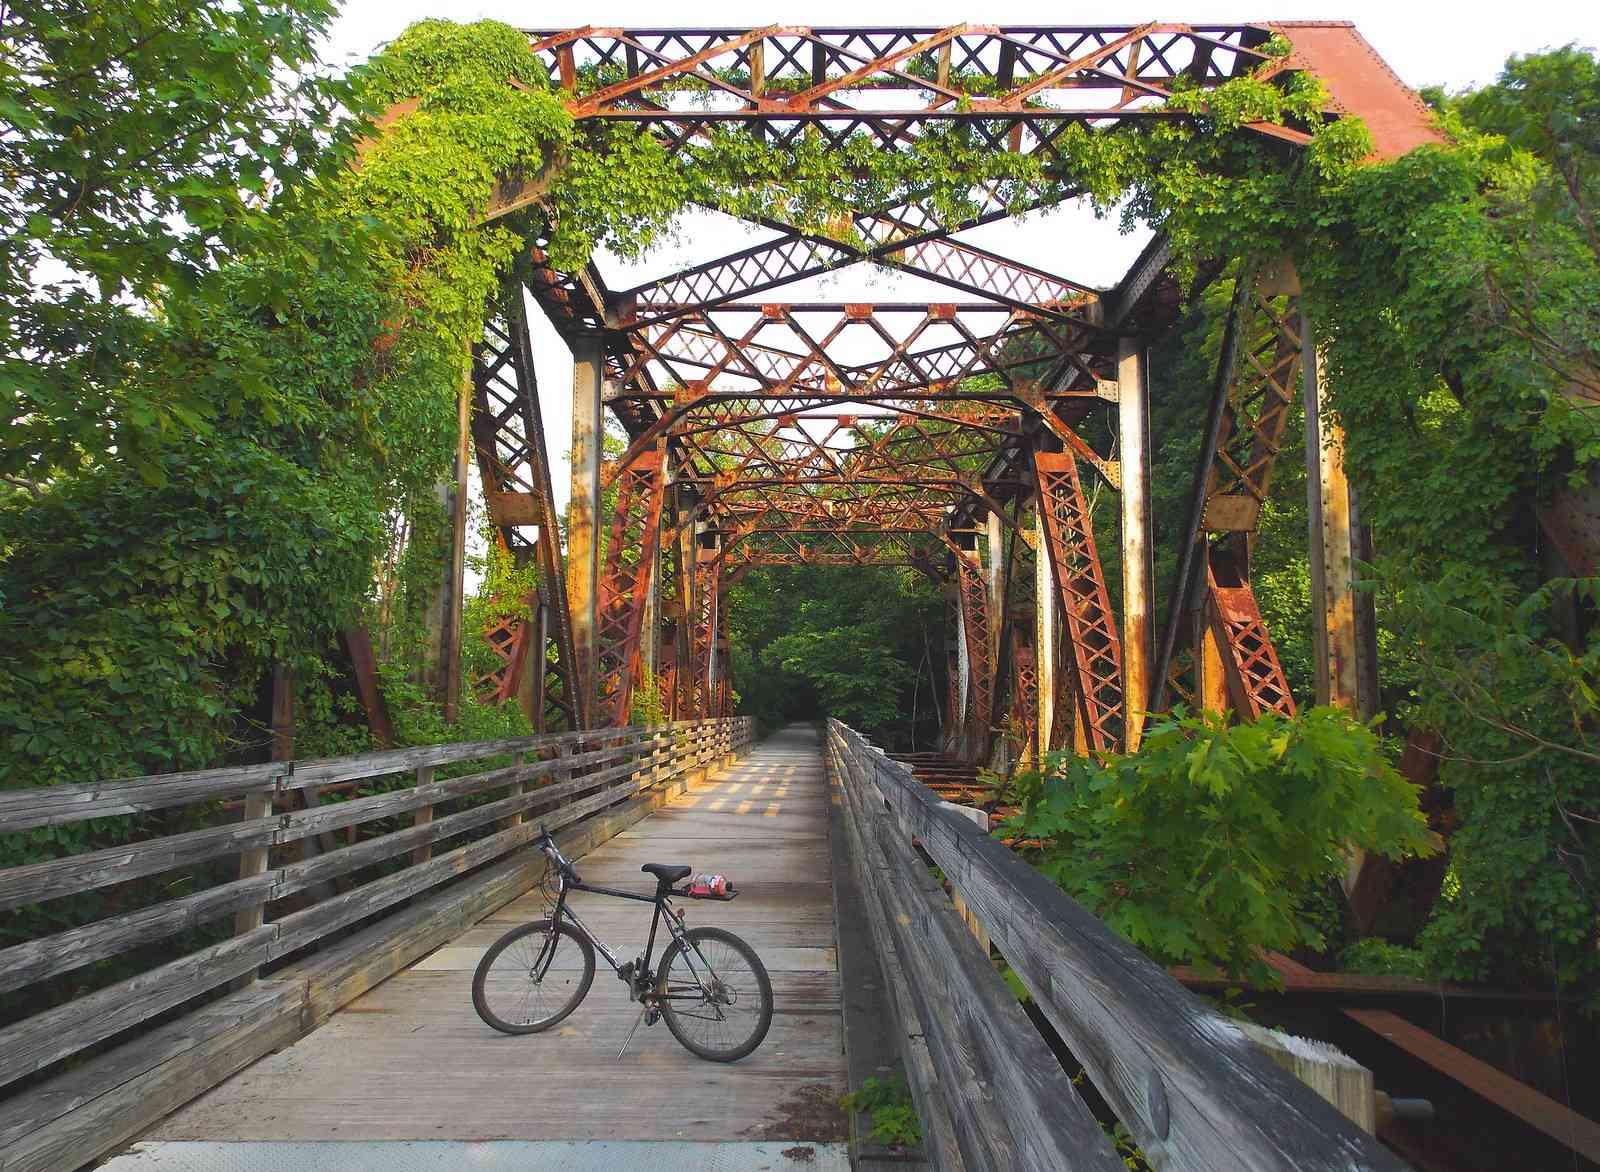 Western Maryland Railway BoWest Bridge